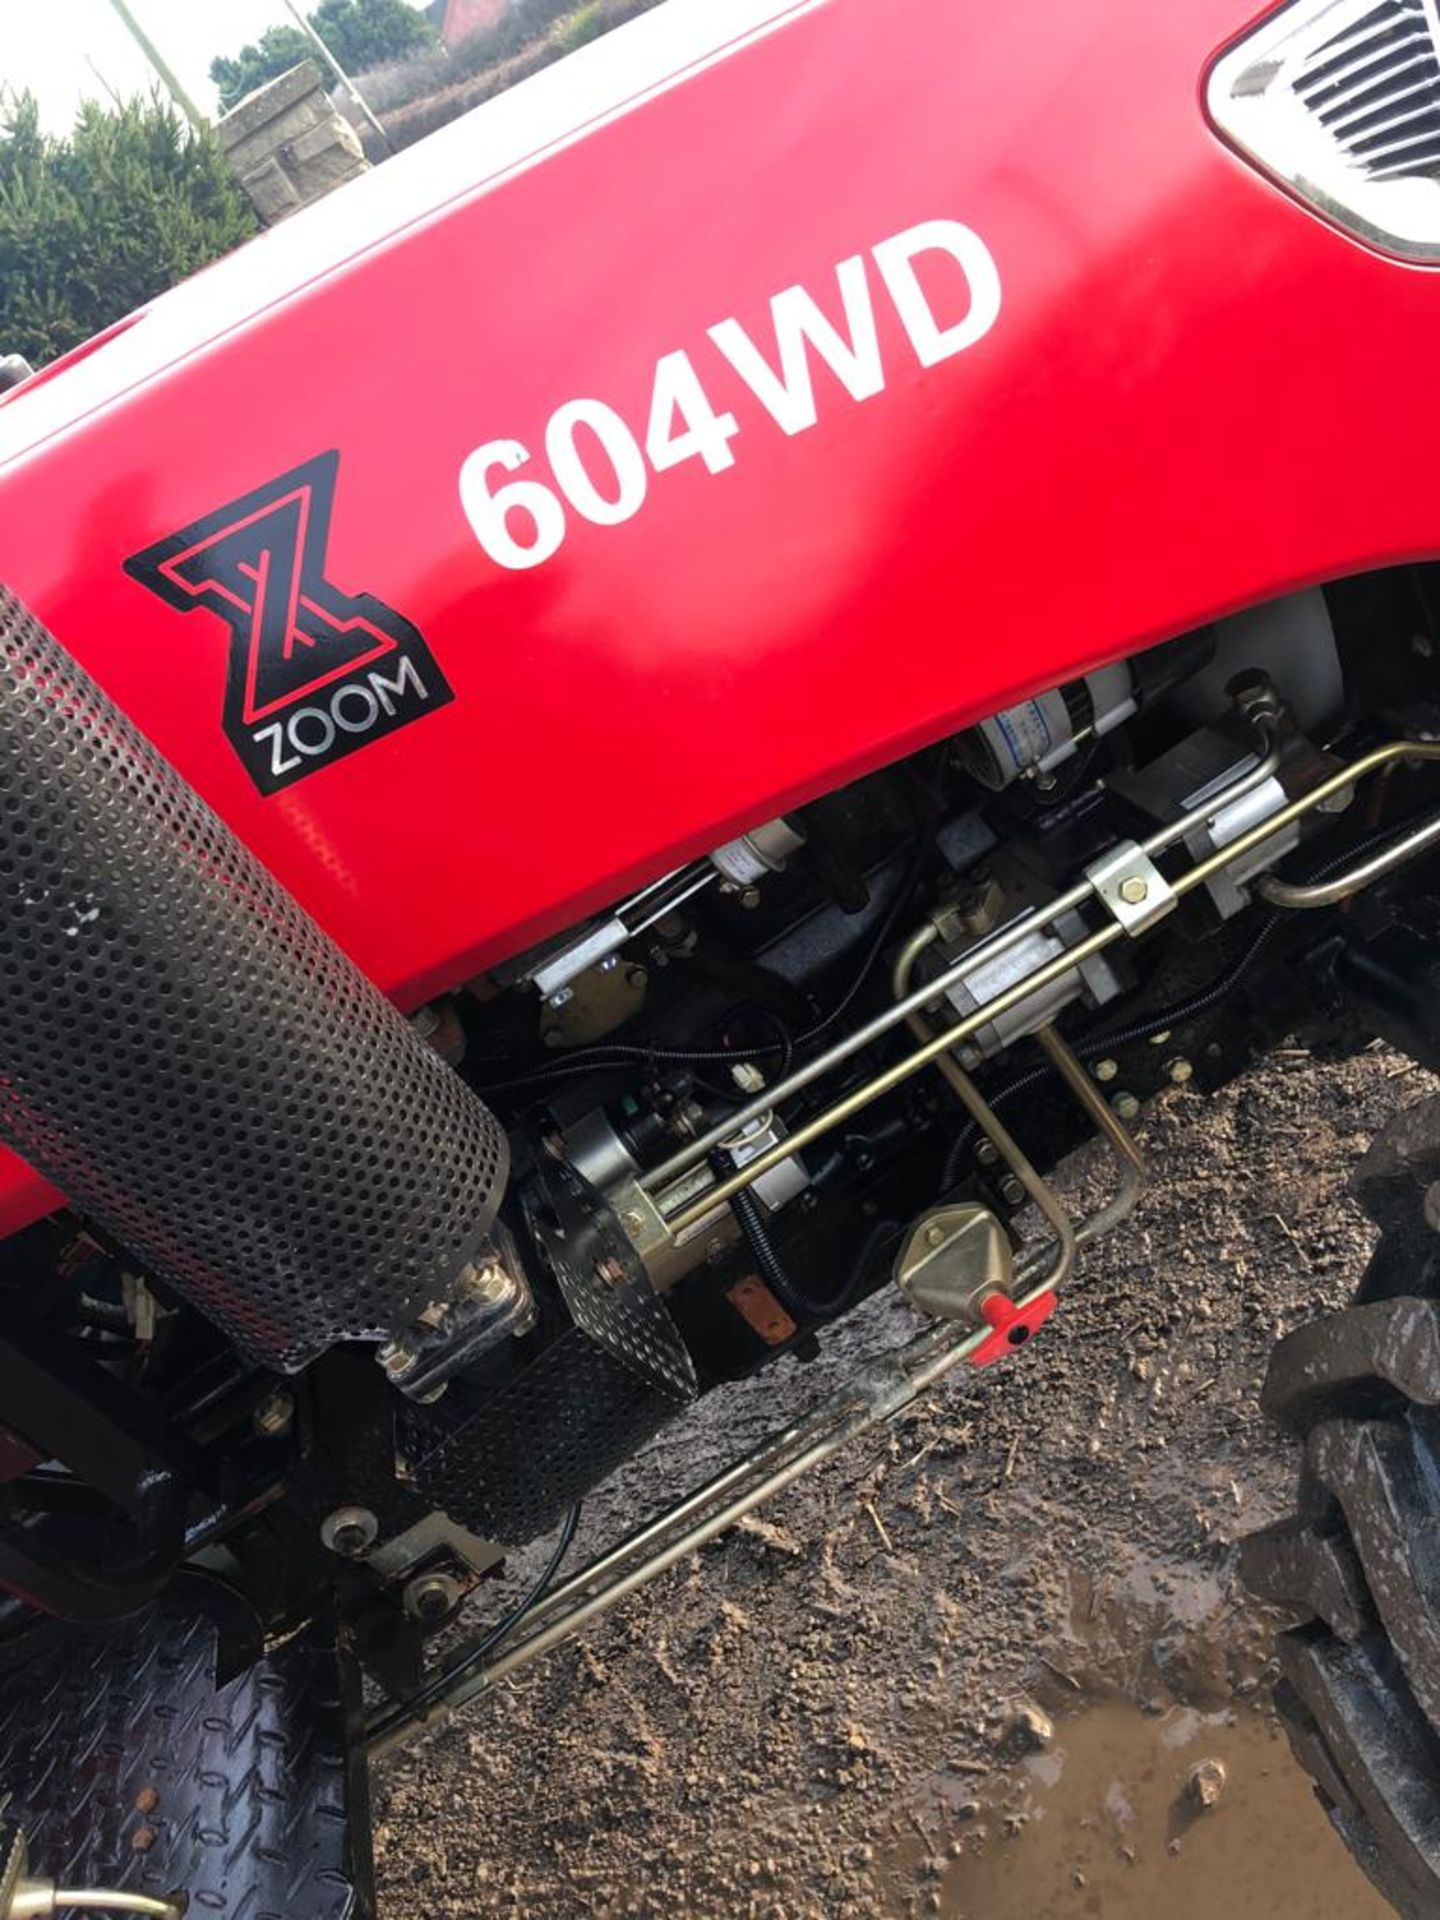 UNUSED ZOOM 604 4WD TRACTOR *PLUS VAT* - Image 3 of 9